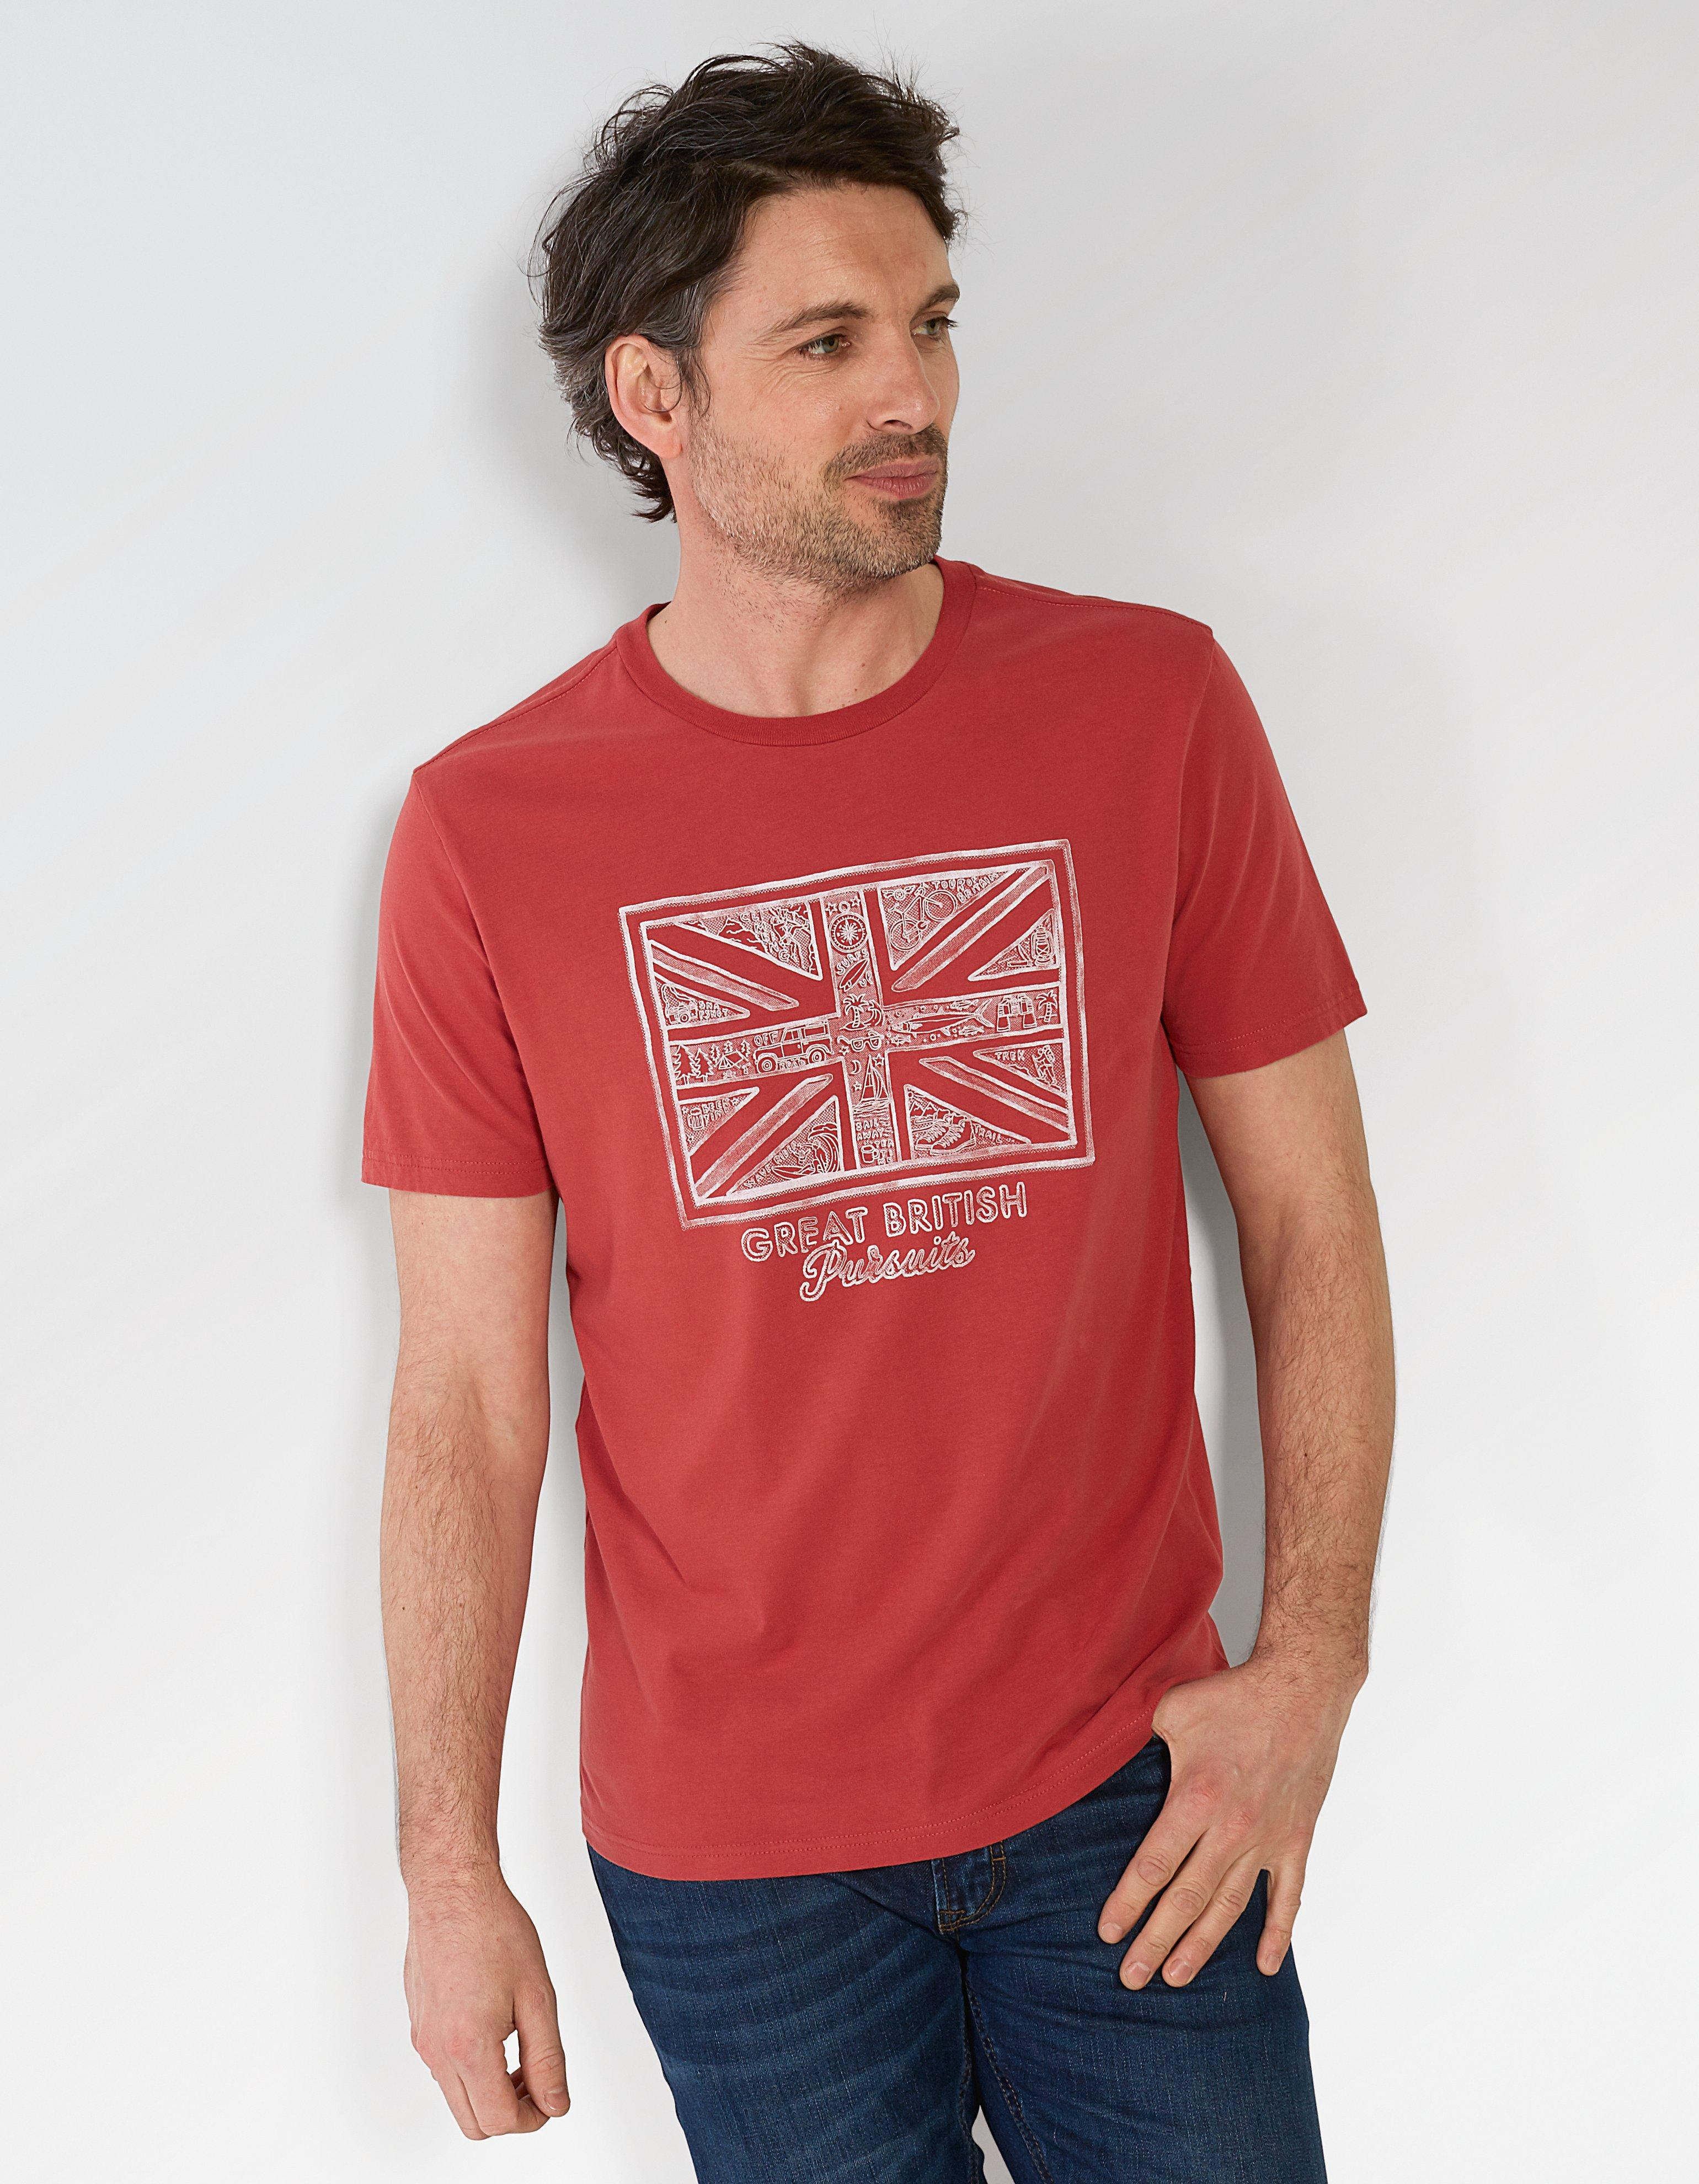 Great British Organic Cotton Graphic T Shirt